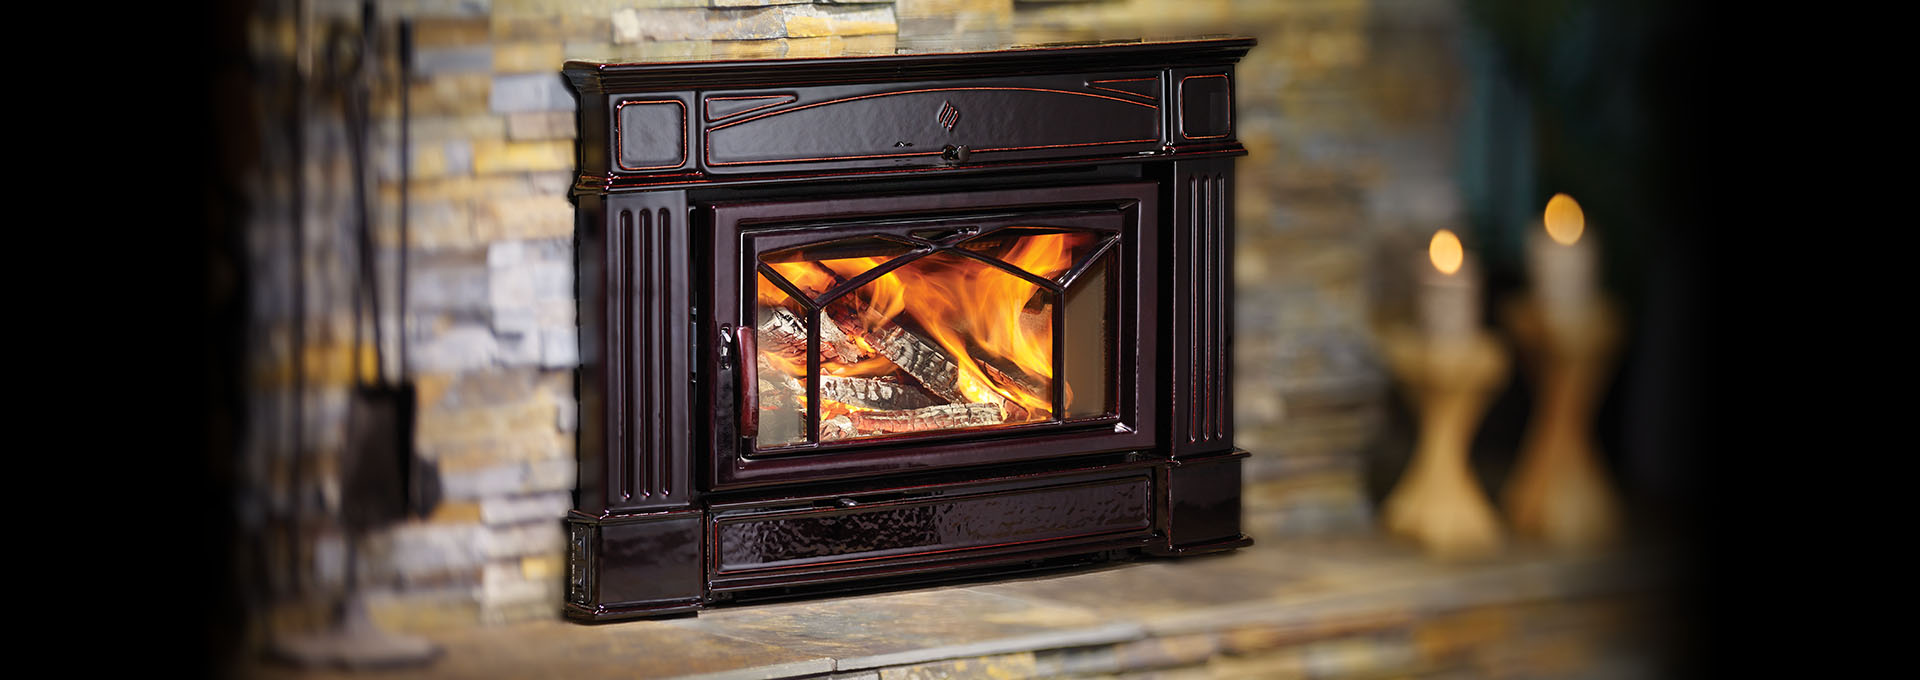 Sensational Rocky Mountain Stove Fireplace Beutiful Home Inspiration Aditmahrainfo